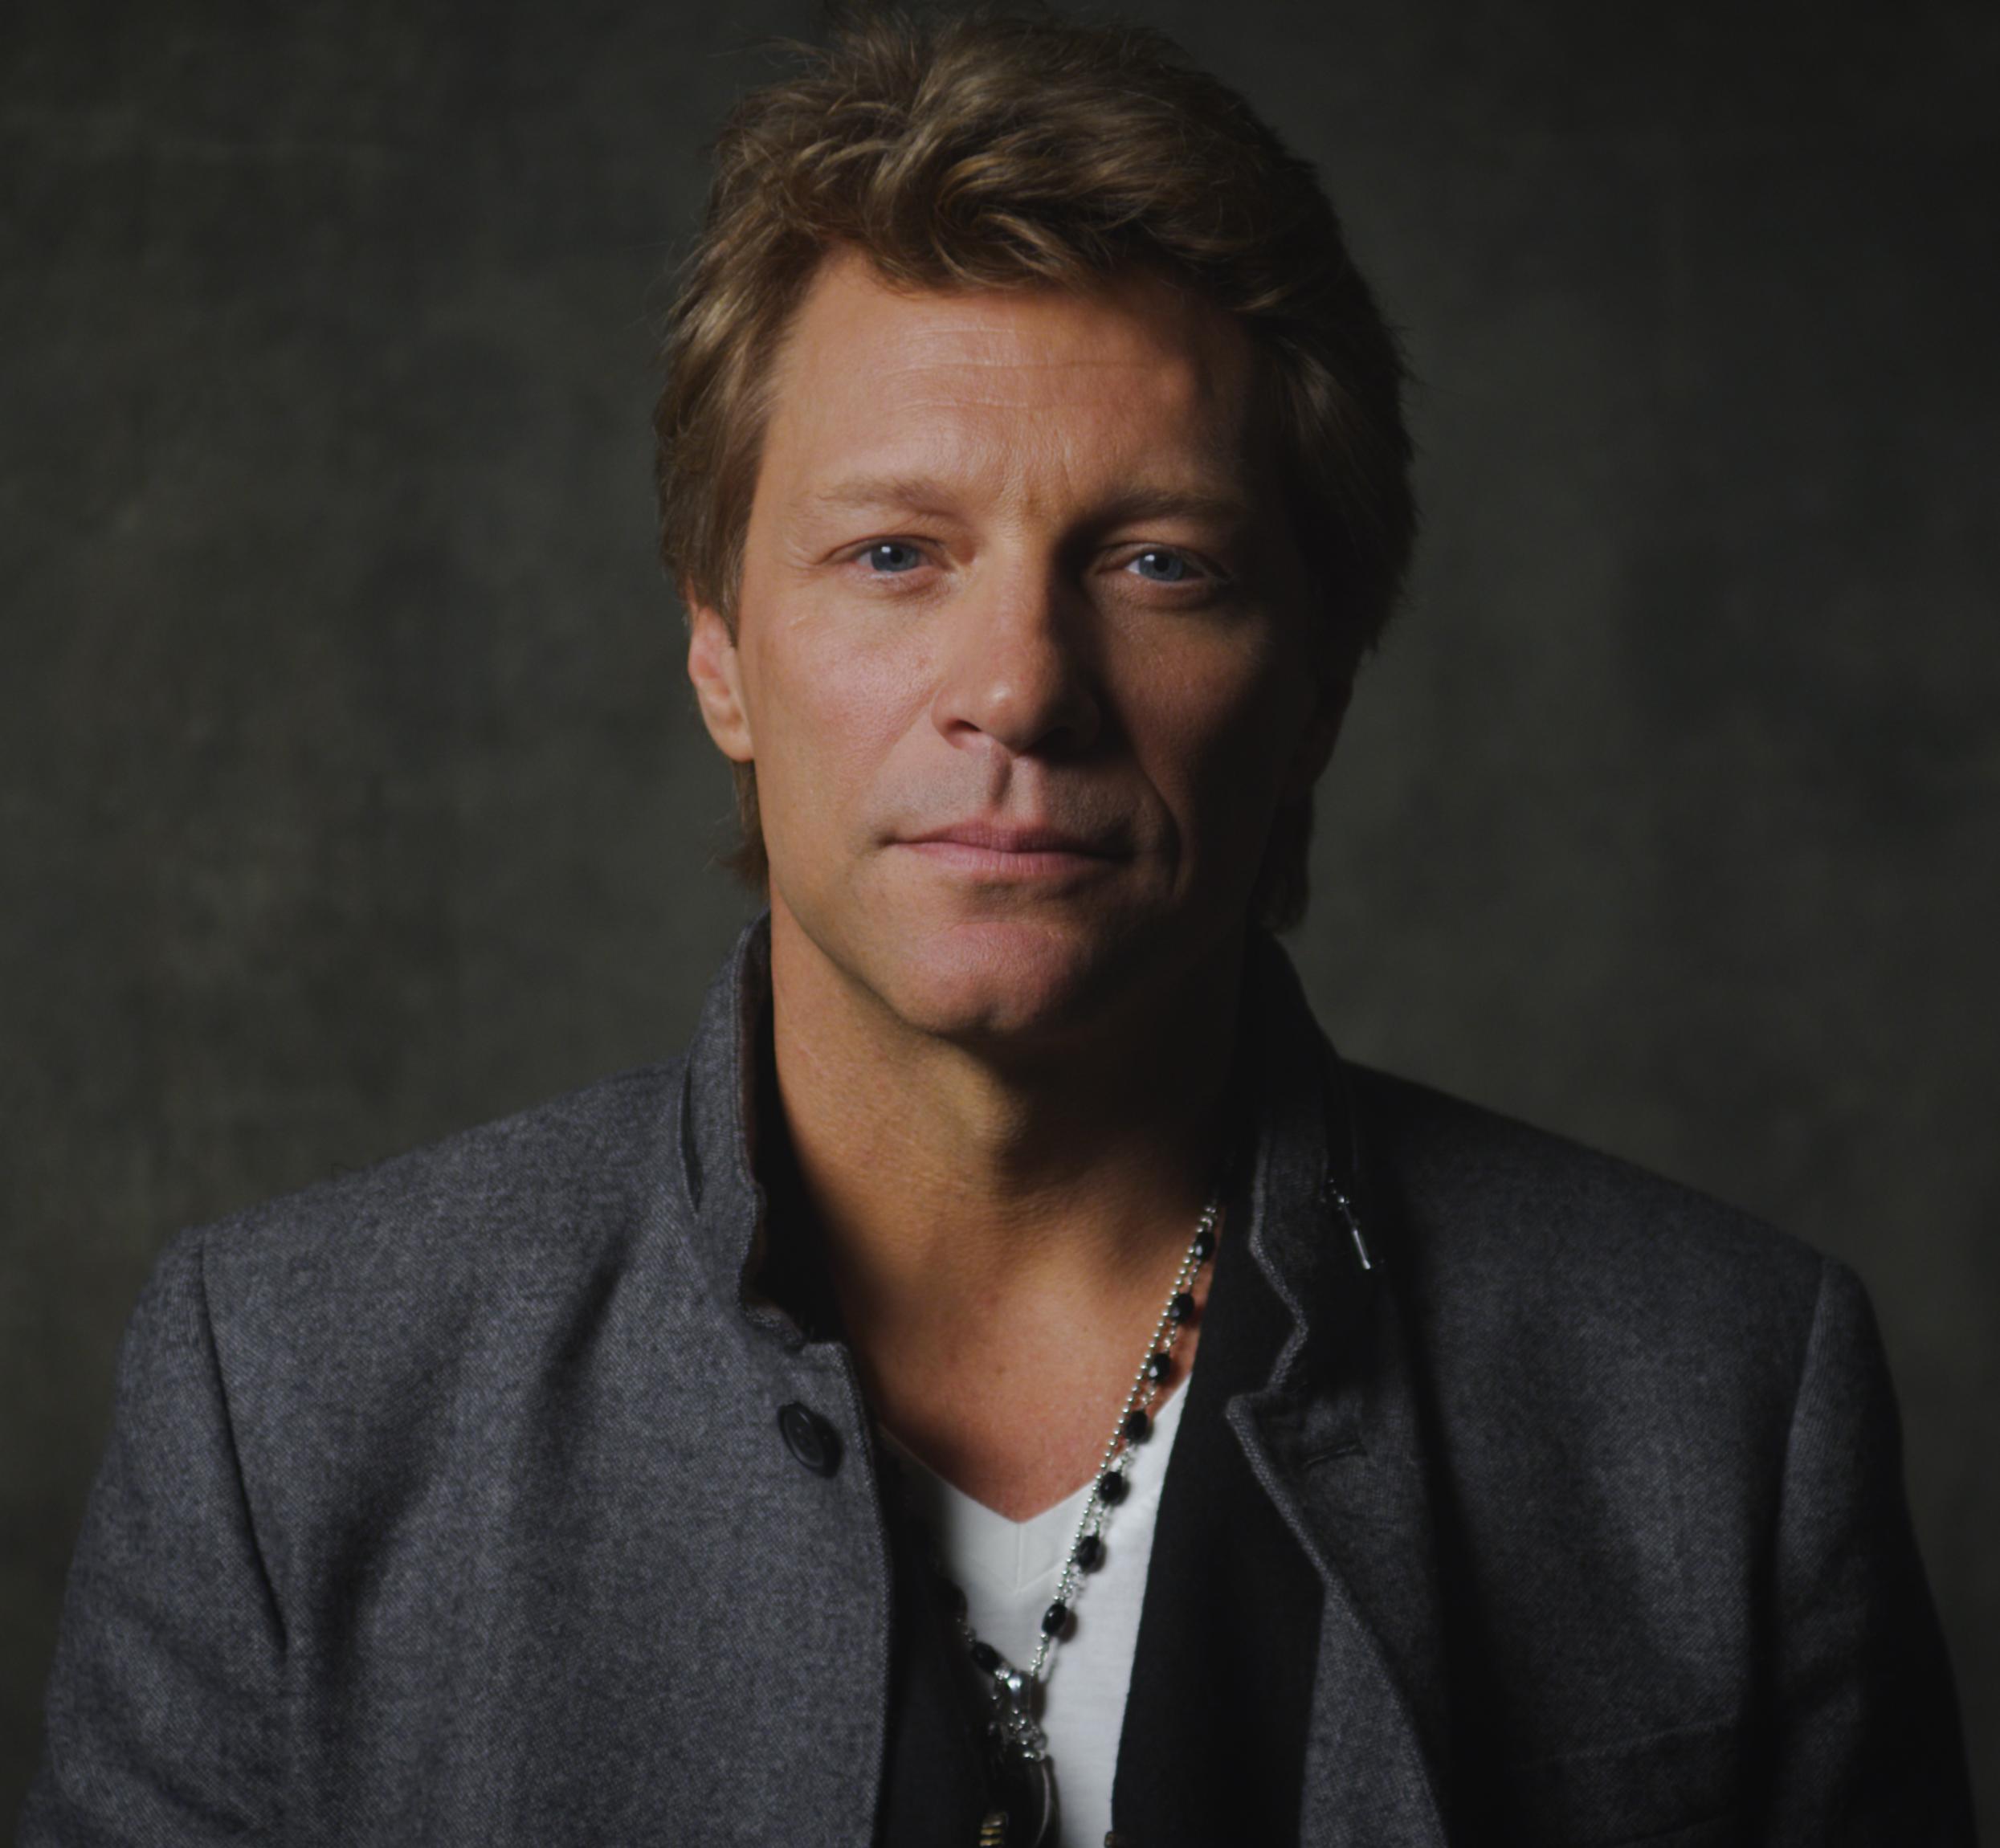 Singer-songwriter Jon Bon Jovi  - age: 2